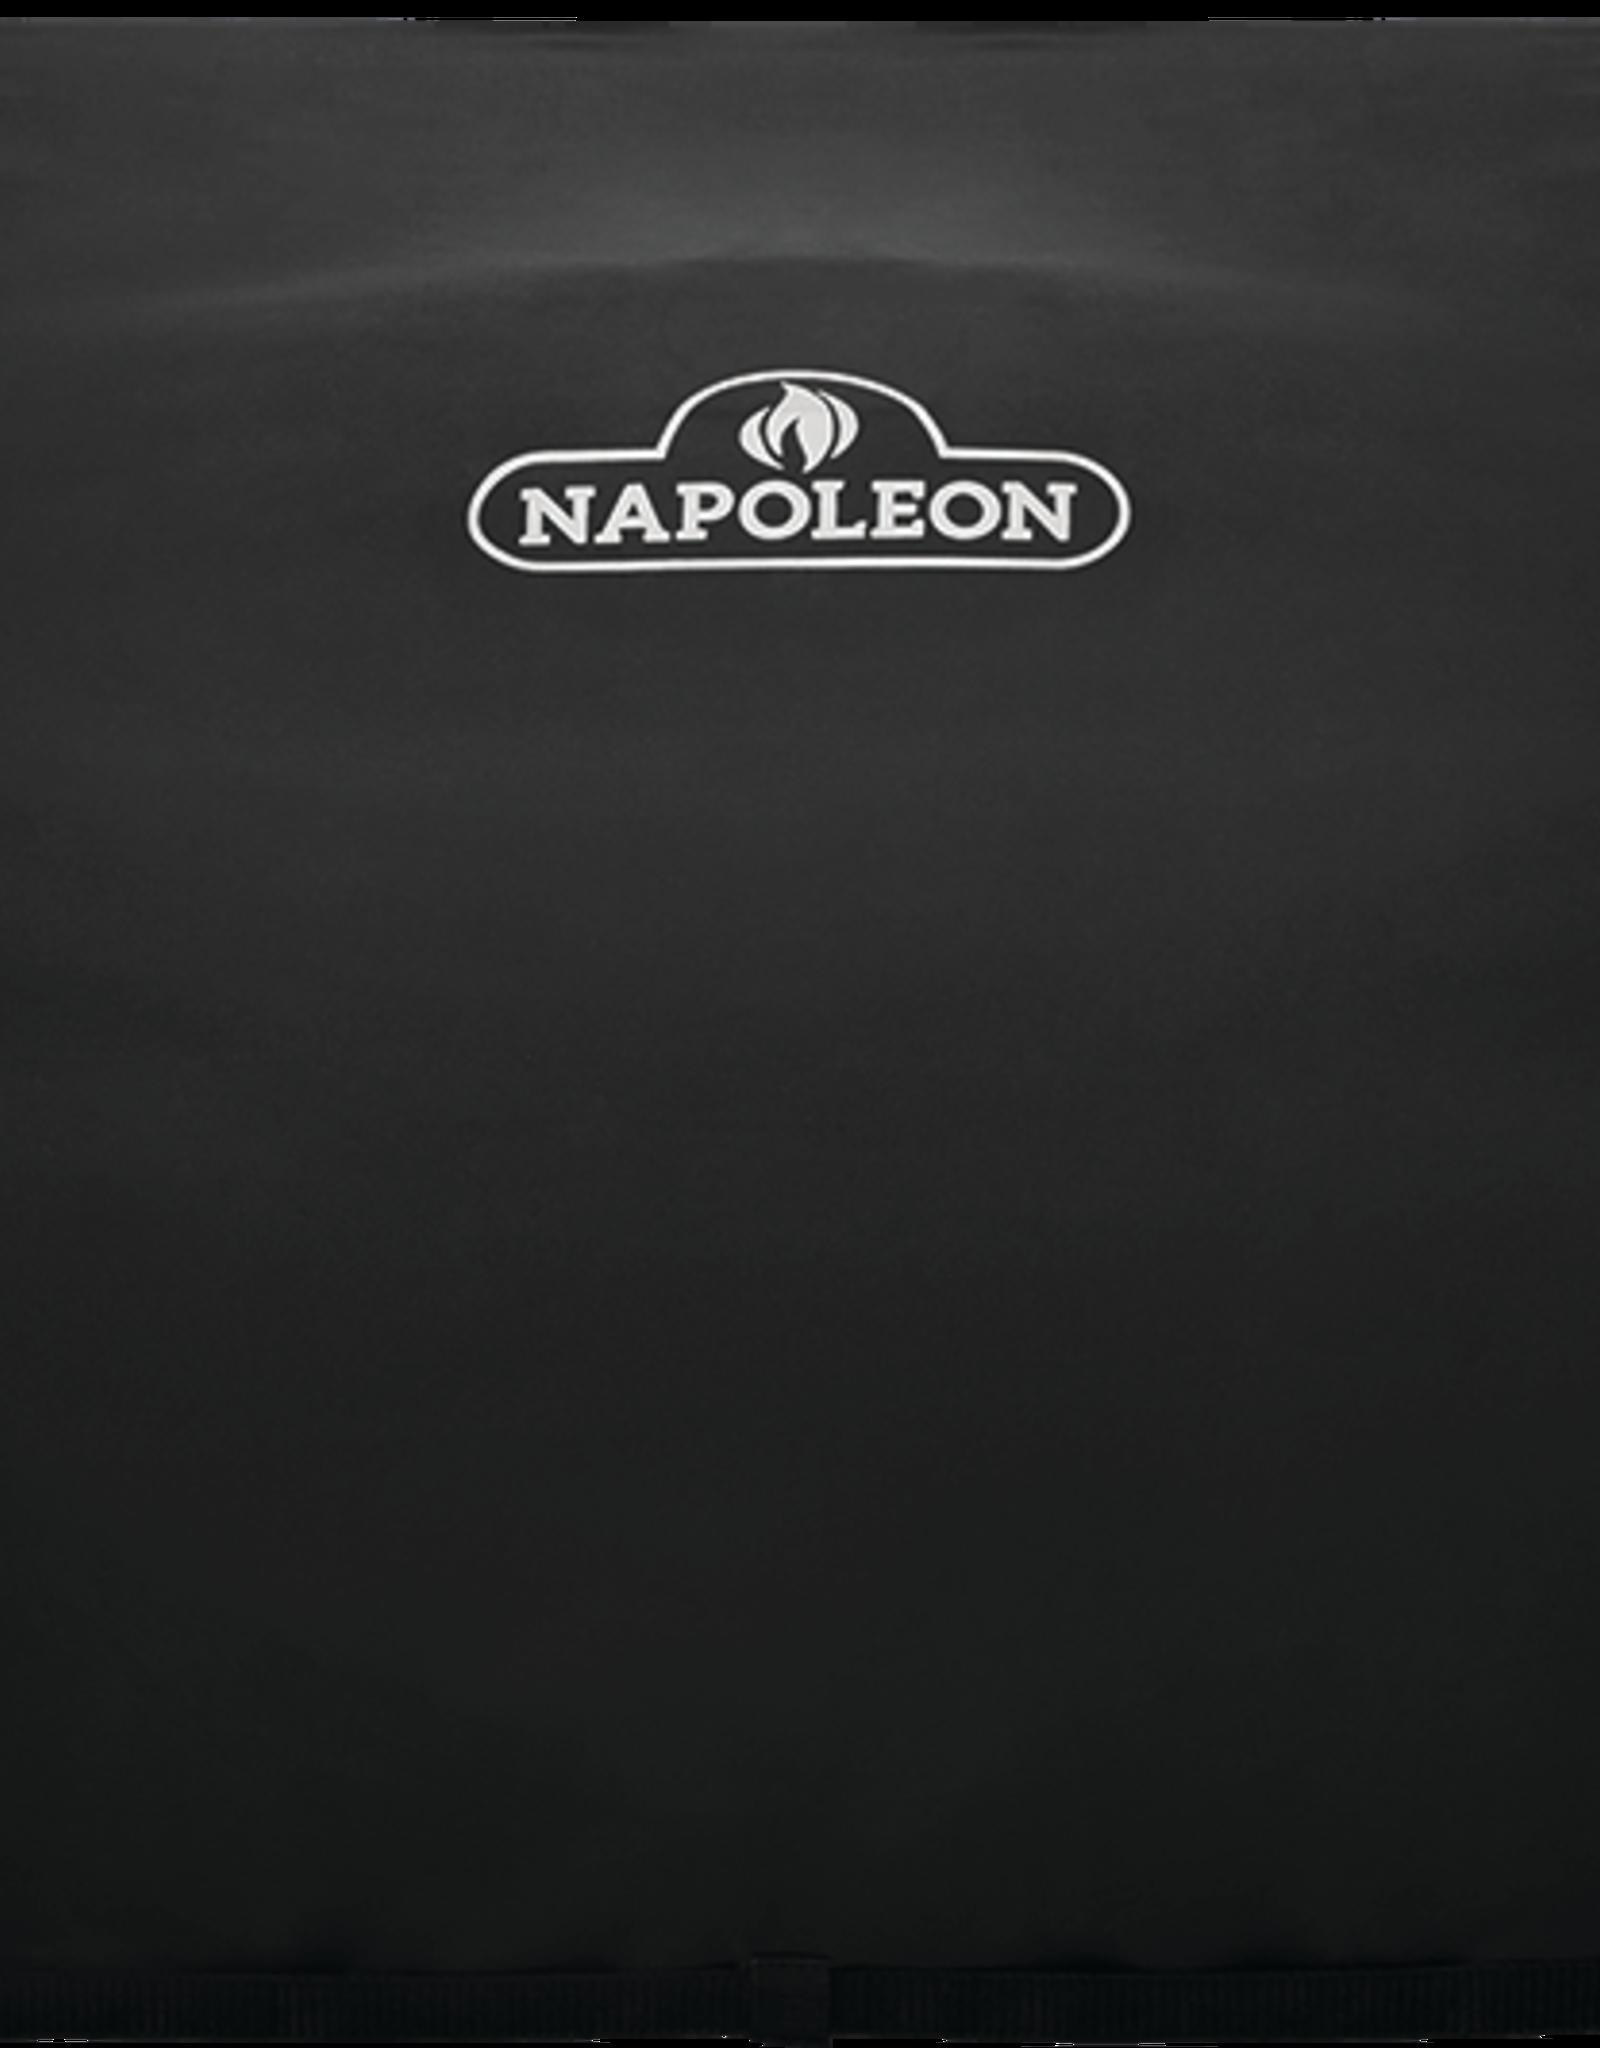 Napoleon Napoleon 700 Series 38 Built-in Cover - 61836